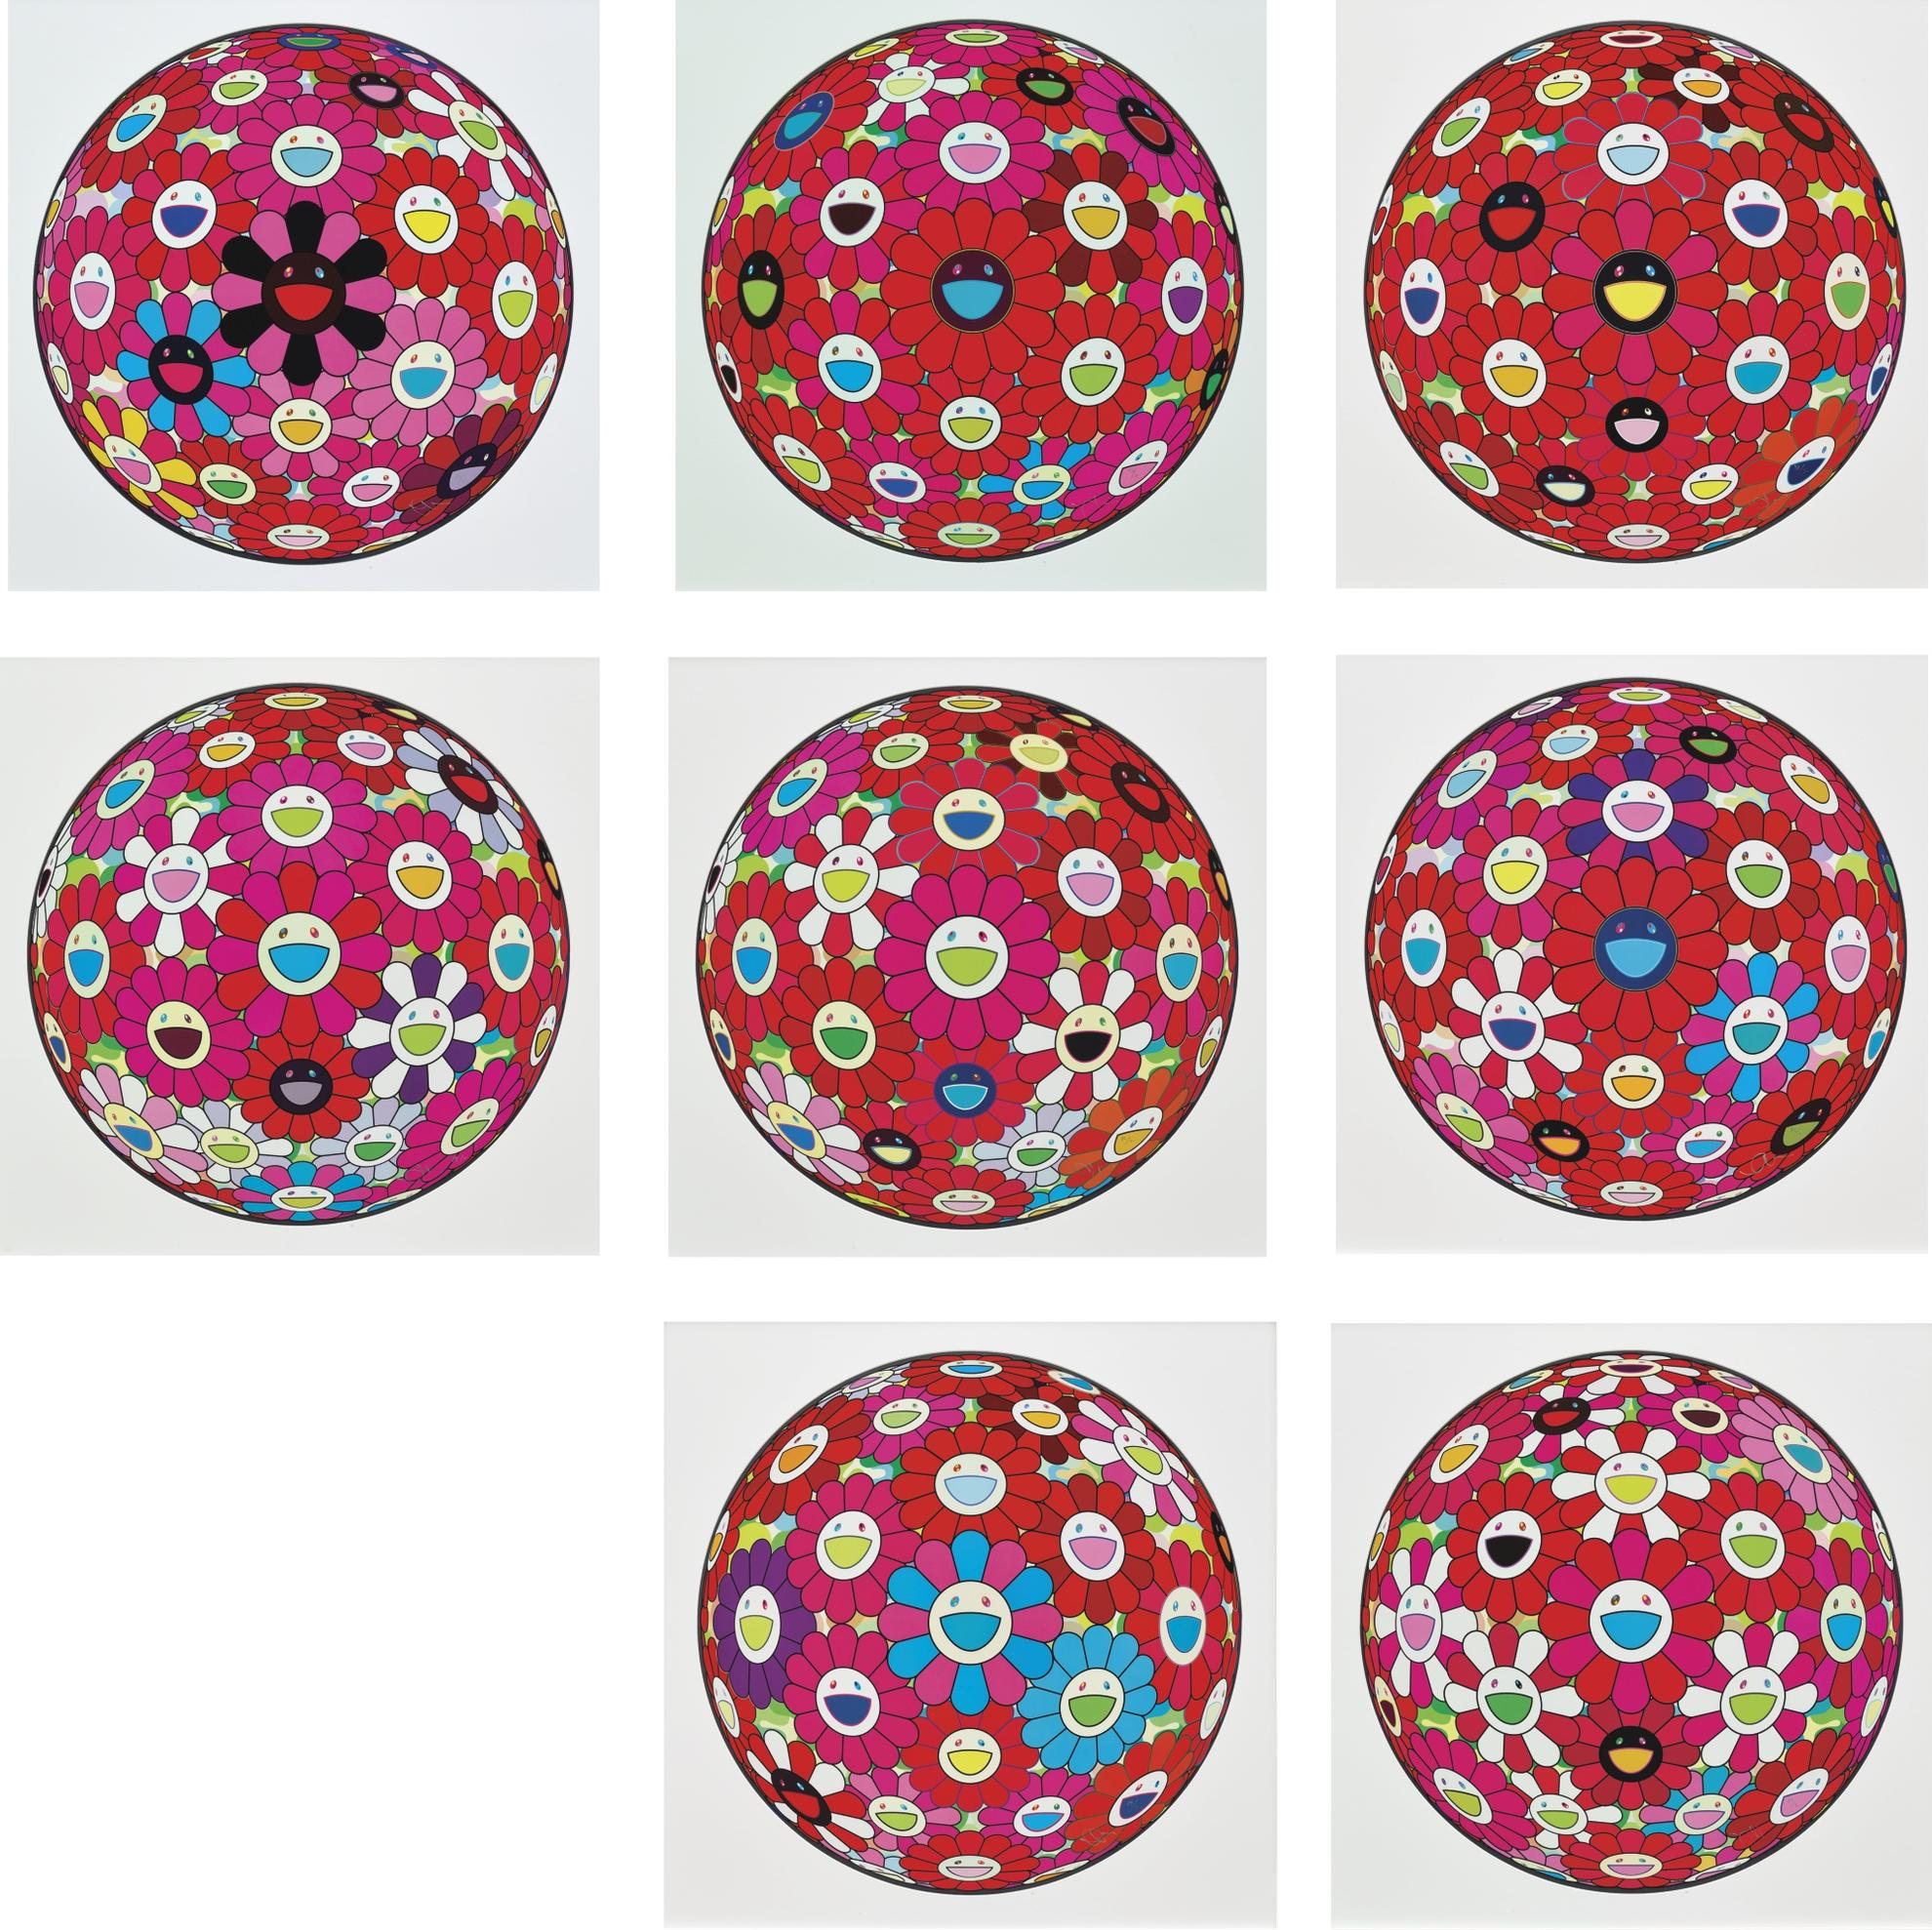 Takashi Murakami-Flowerball Series And Other (Eight Works)-2014